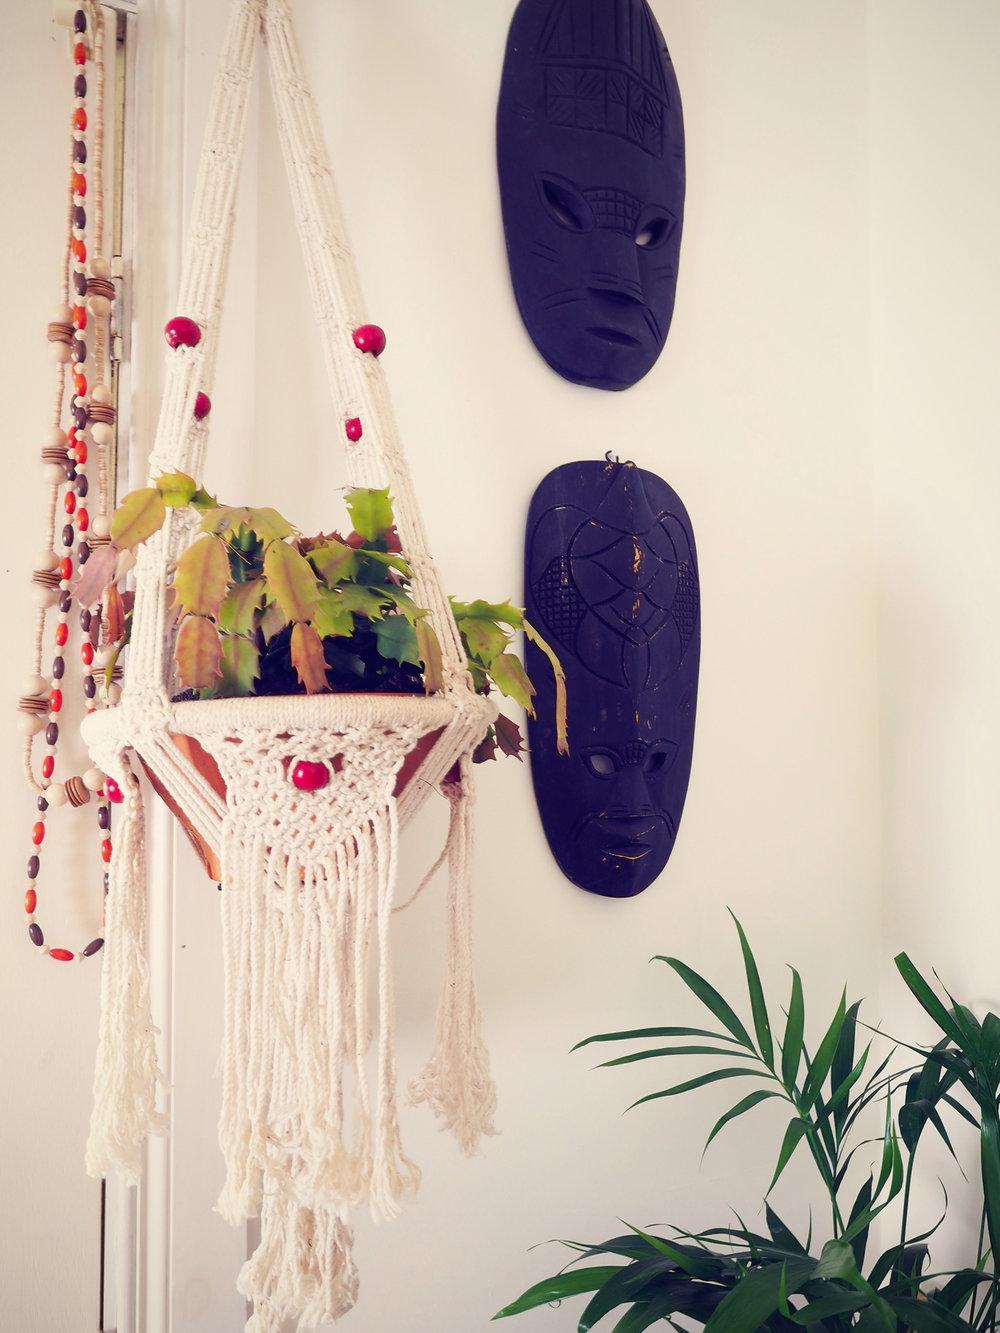 eclectic home decor - macrame hanging planter, tiki masks